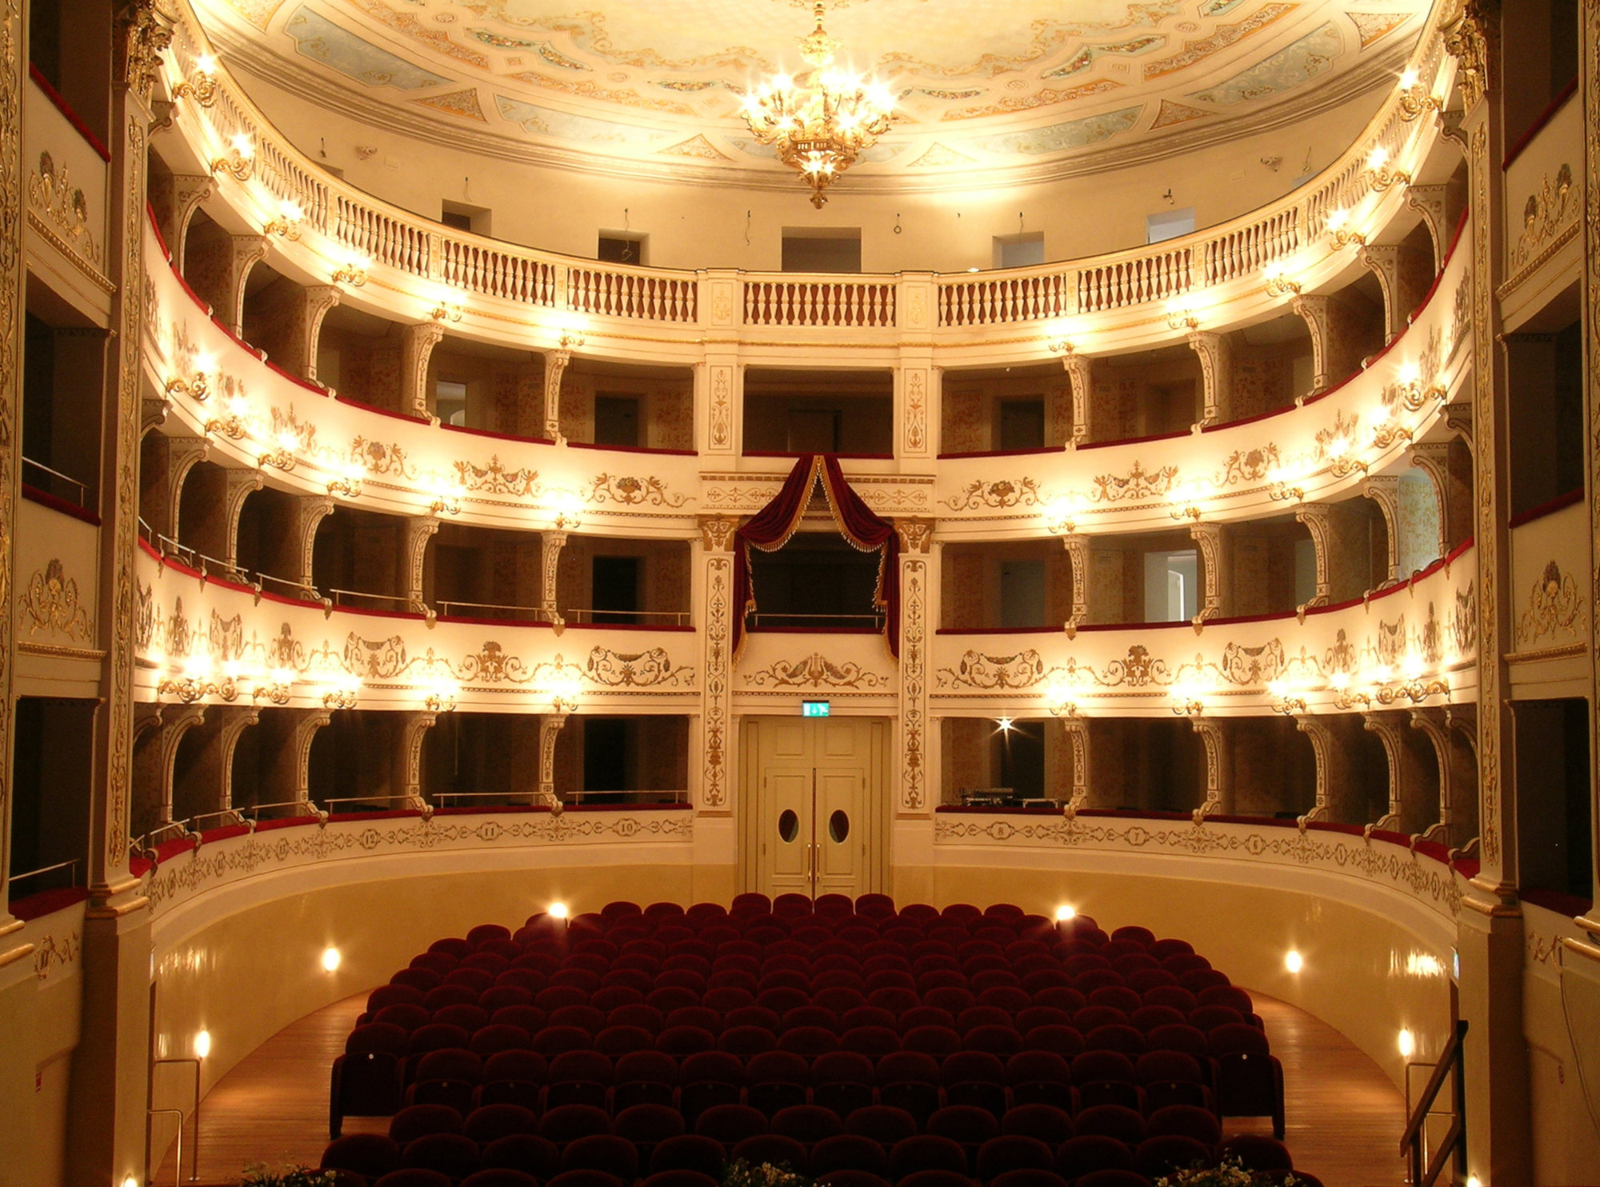 Teatro Alfieri Castelnuovo Garfagnana